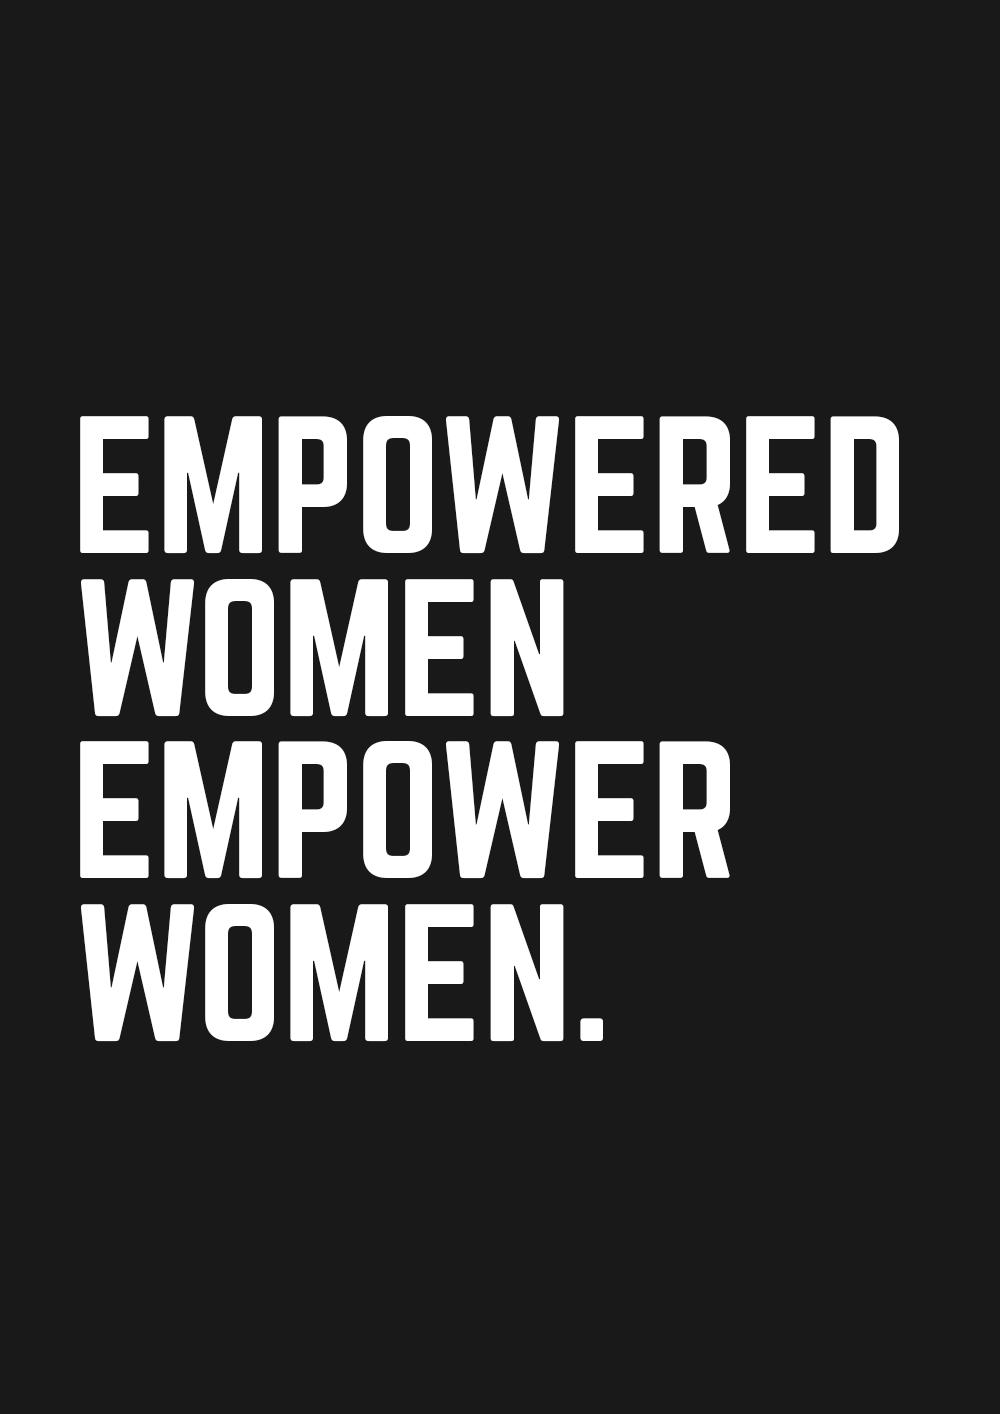 30 Empowerment Quotes For Women Black White Black Empowerment Quotes White Women Motivational Quotes For Women Woman Quotes Empowerment Quotes